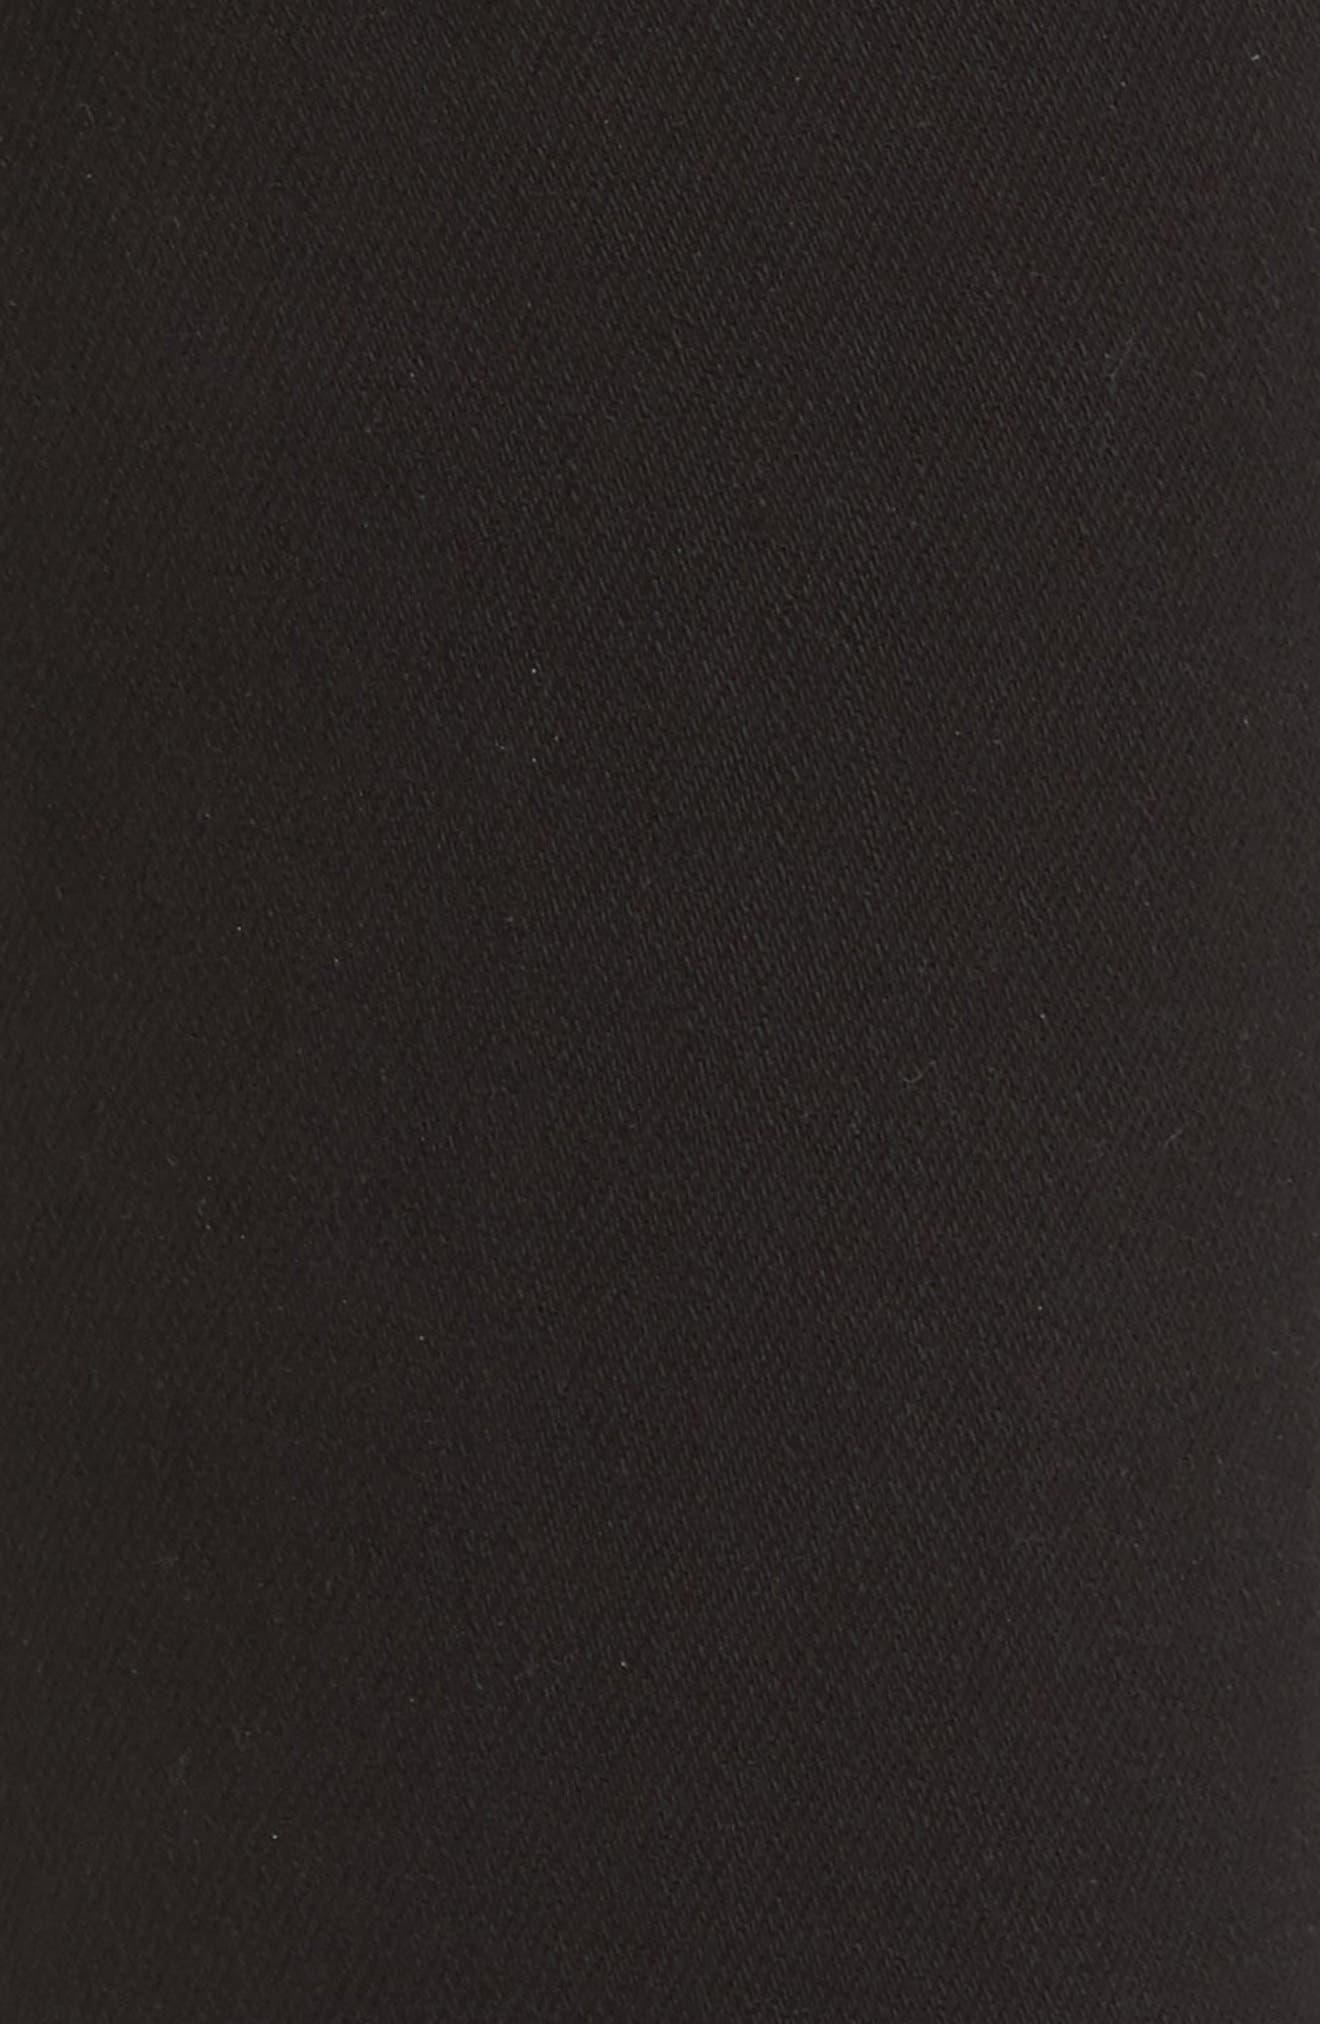 L'AGENCE, Highline High Waist Fray Hem Skinny Jeans, Alternate thumbnail 6, color, SATURATED BLACK DESTRUCT